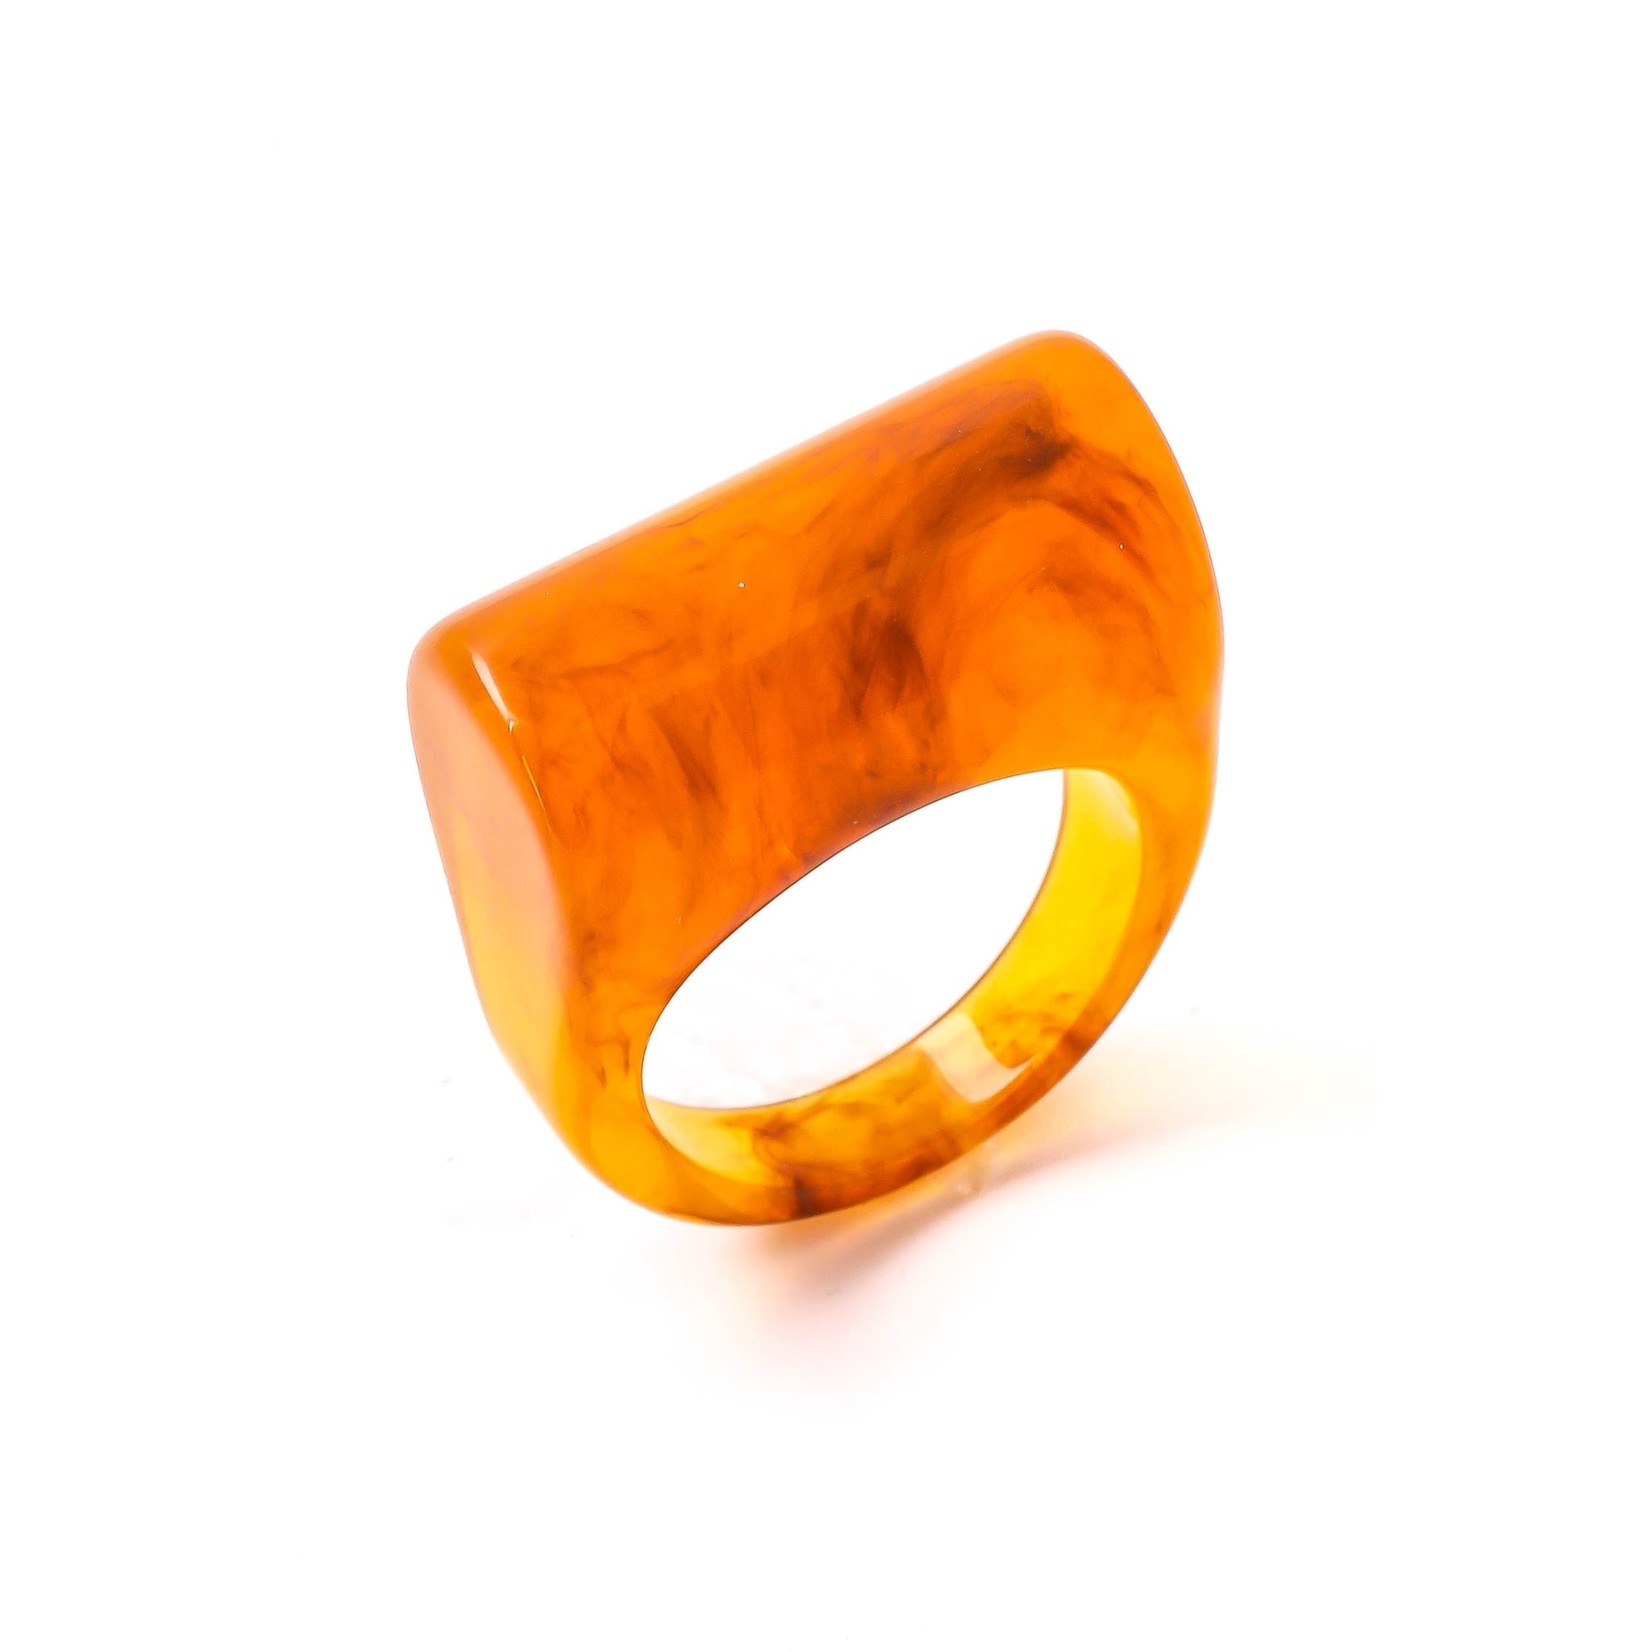 Anarchy Street Anarchy Street Geometric Acrylic Ring Brown